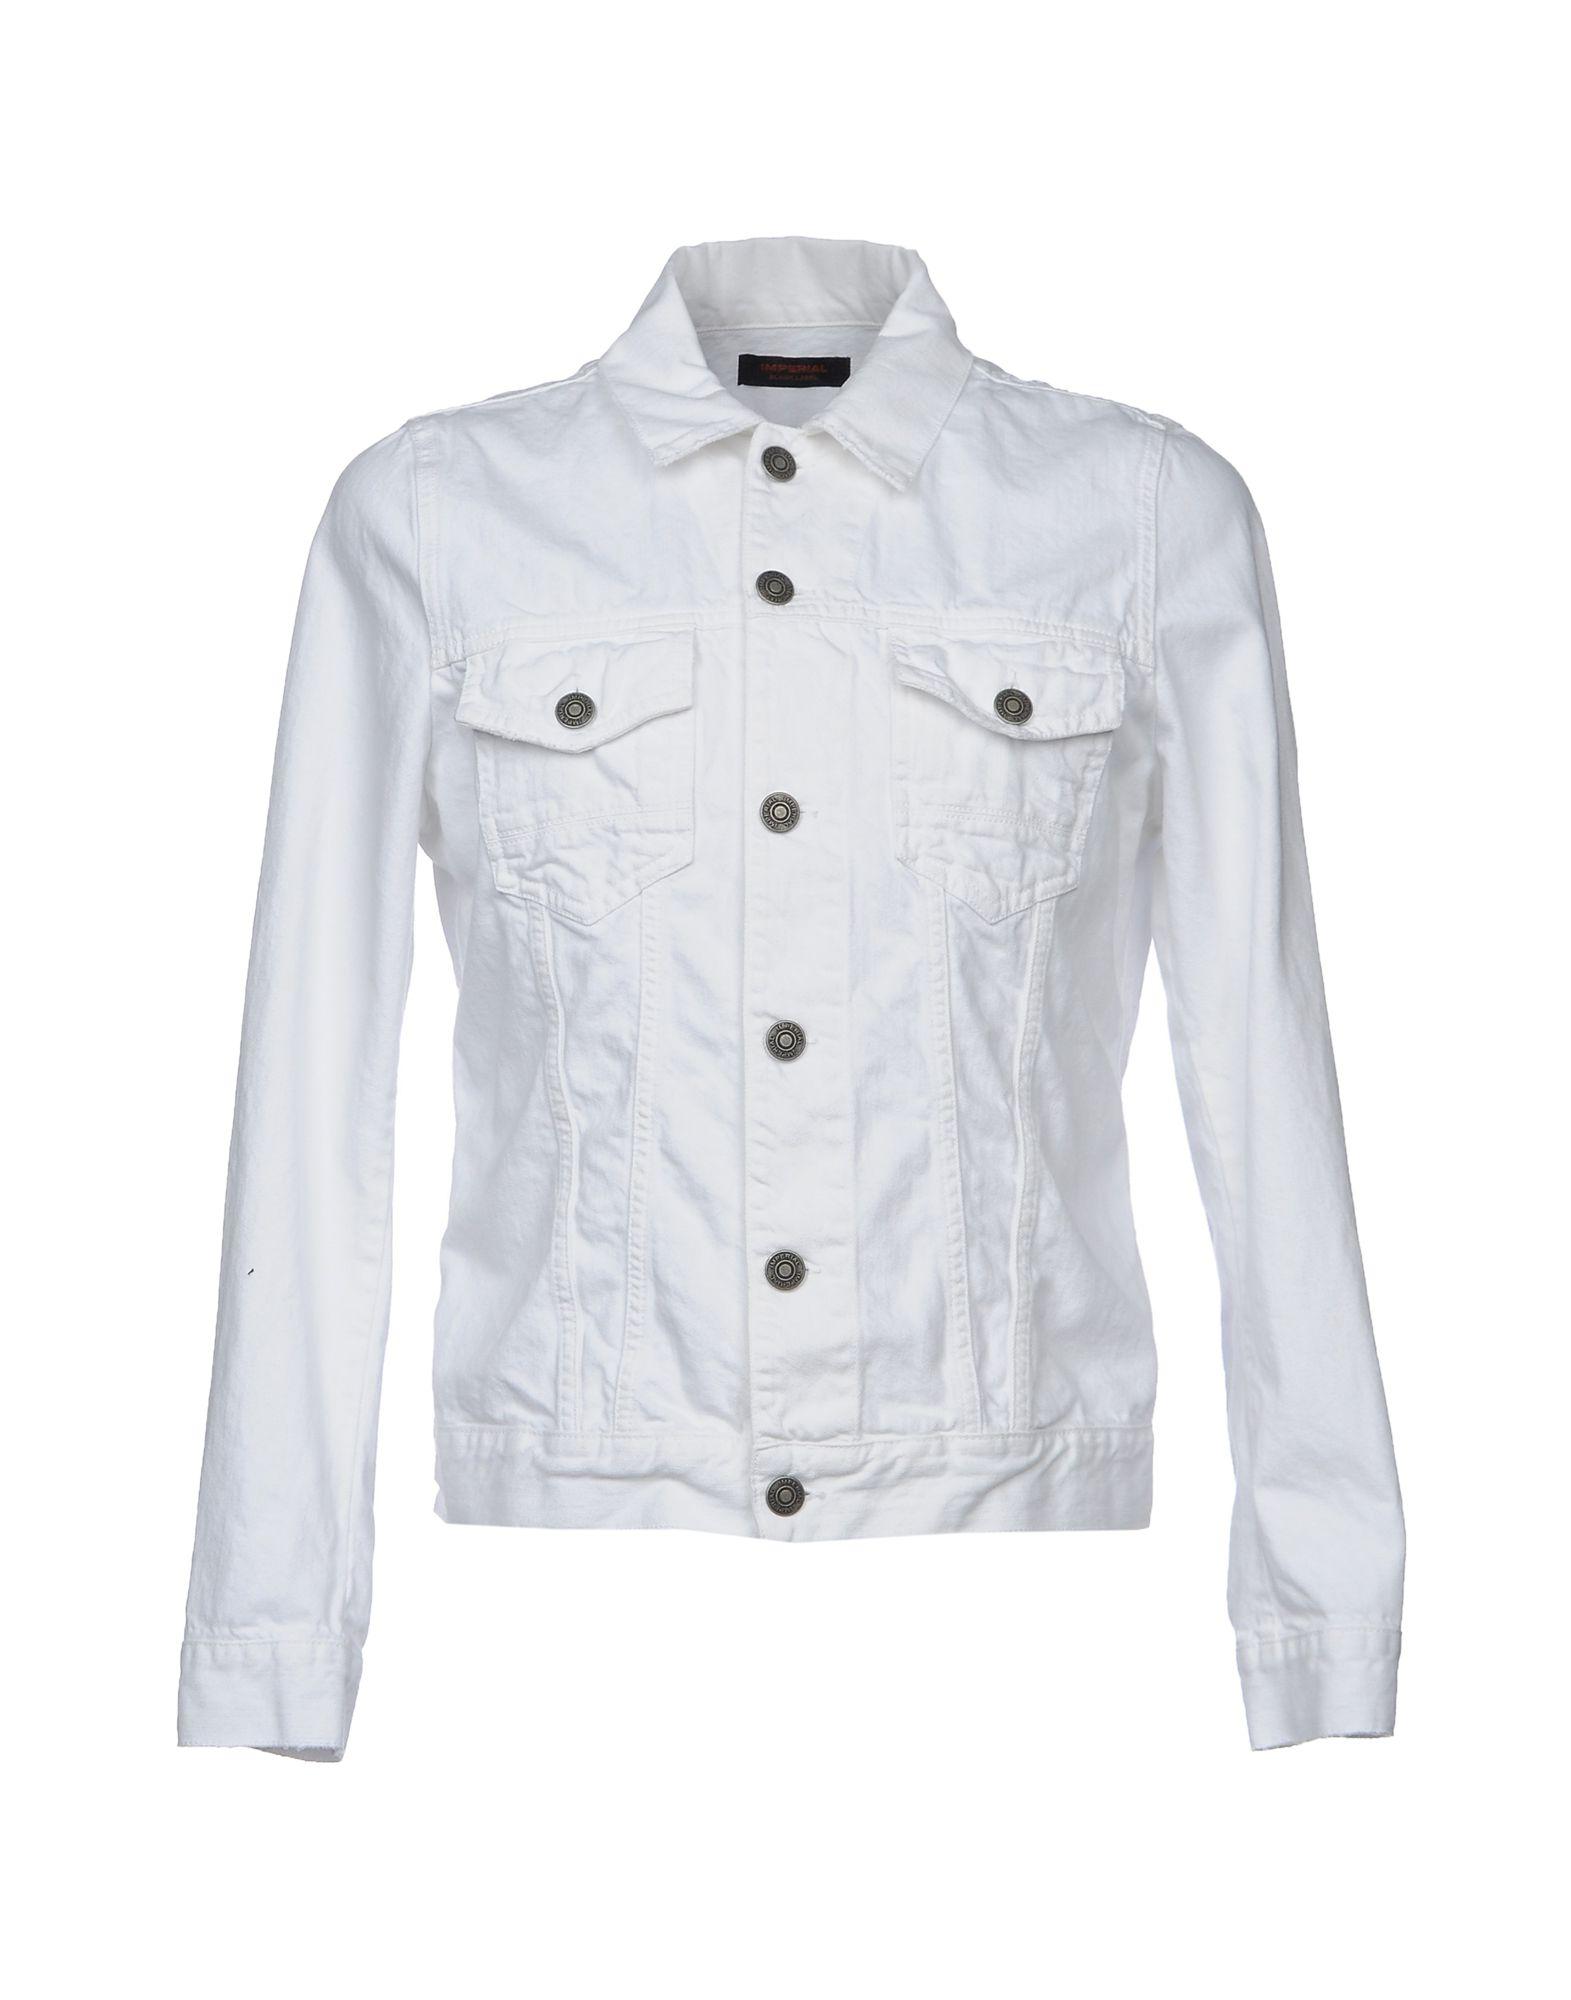 IMPERIAL Джинсовая верхняя одежда wood wood джинсовая верхняя одежда